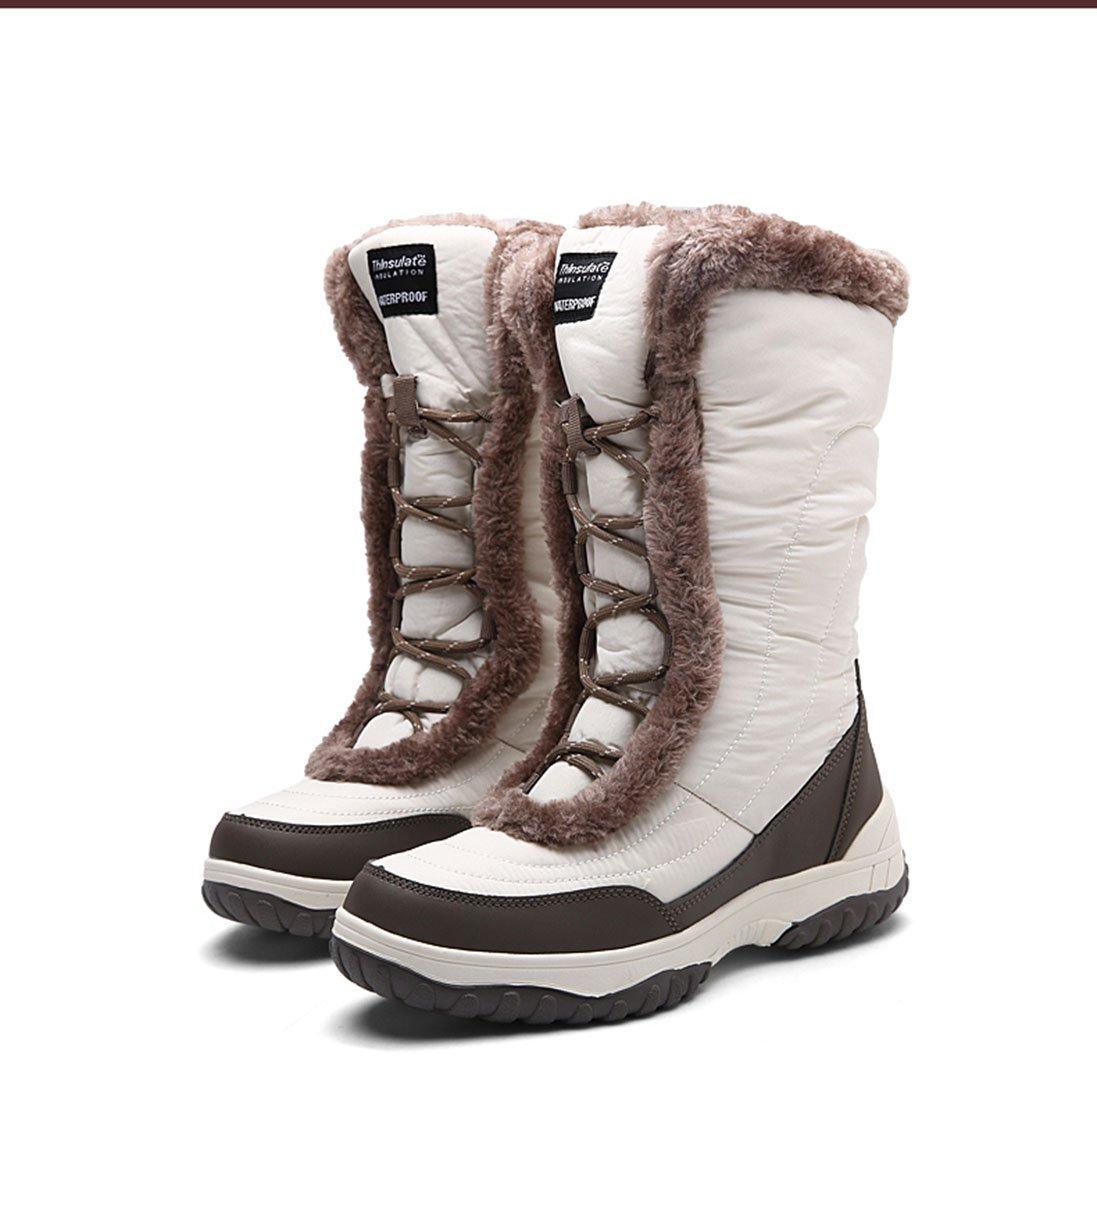 Winter outdoor snow boots women cotton tube waterproof 2017 new flat plus cashmere cotton shoes shoes boots ( Color : White , Size : 5.5 B(M)US )